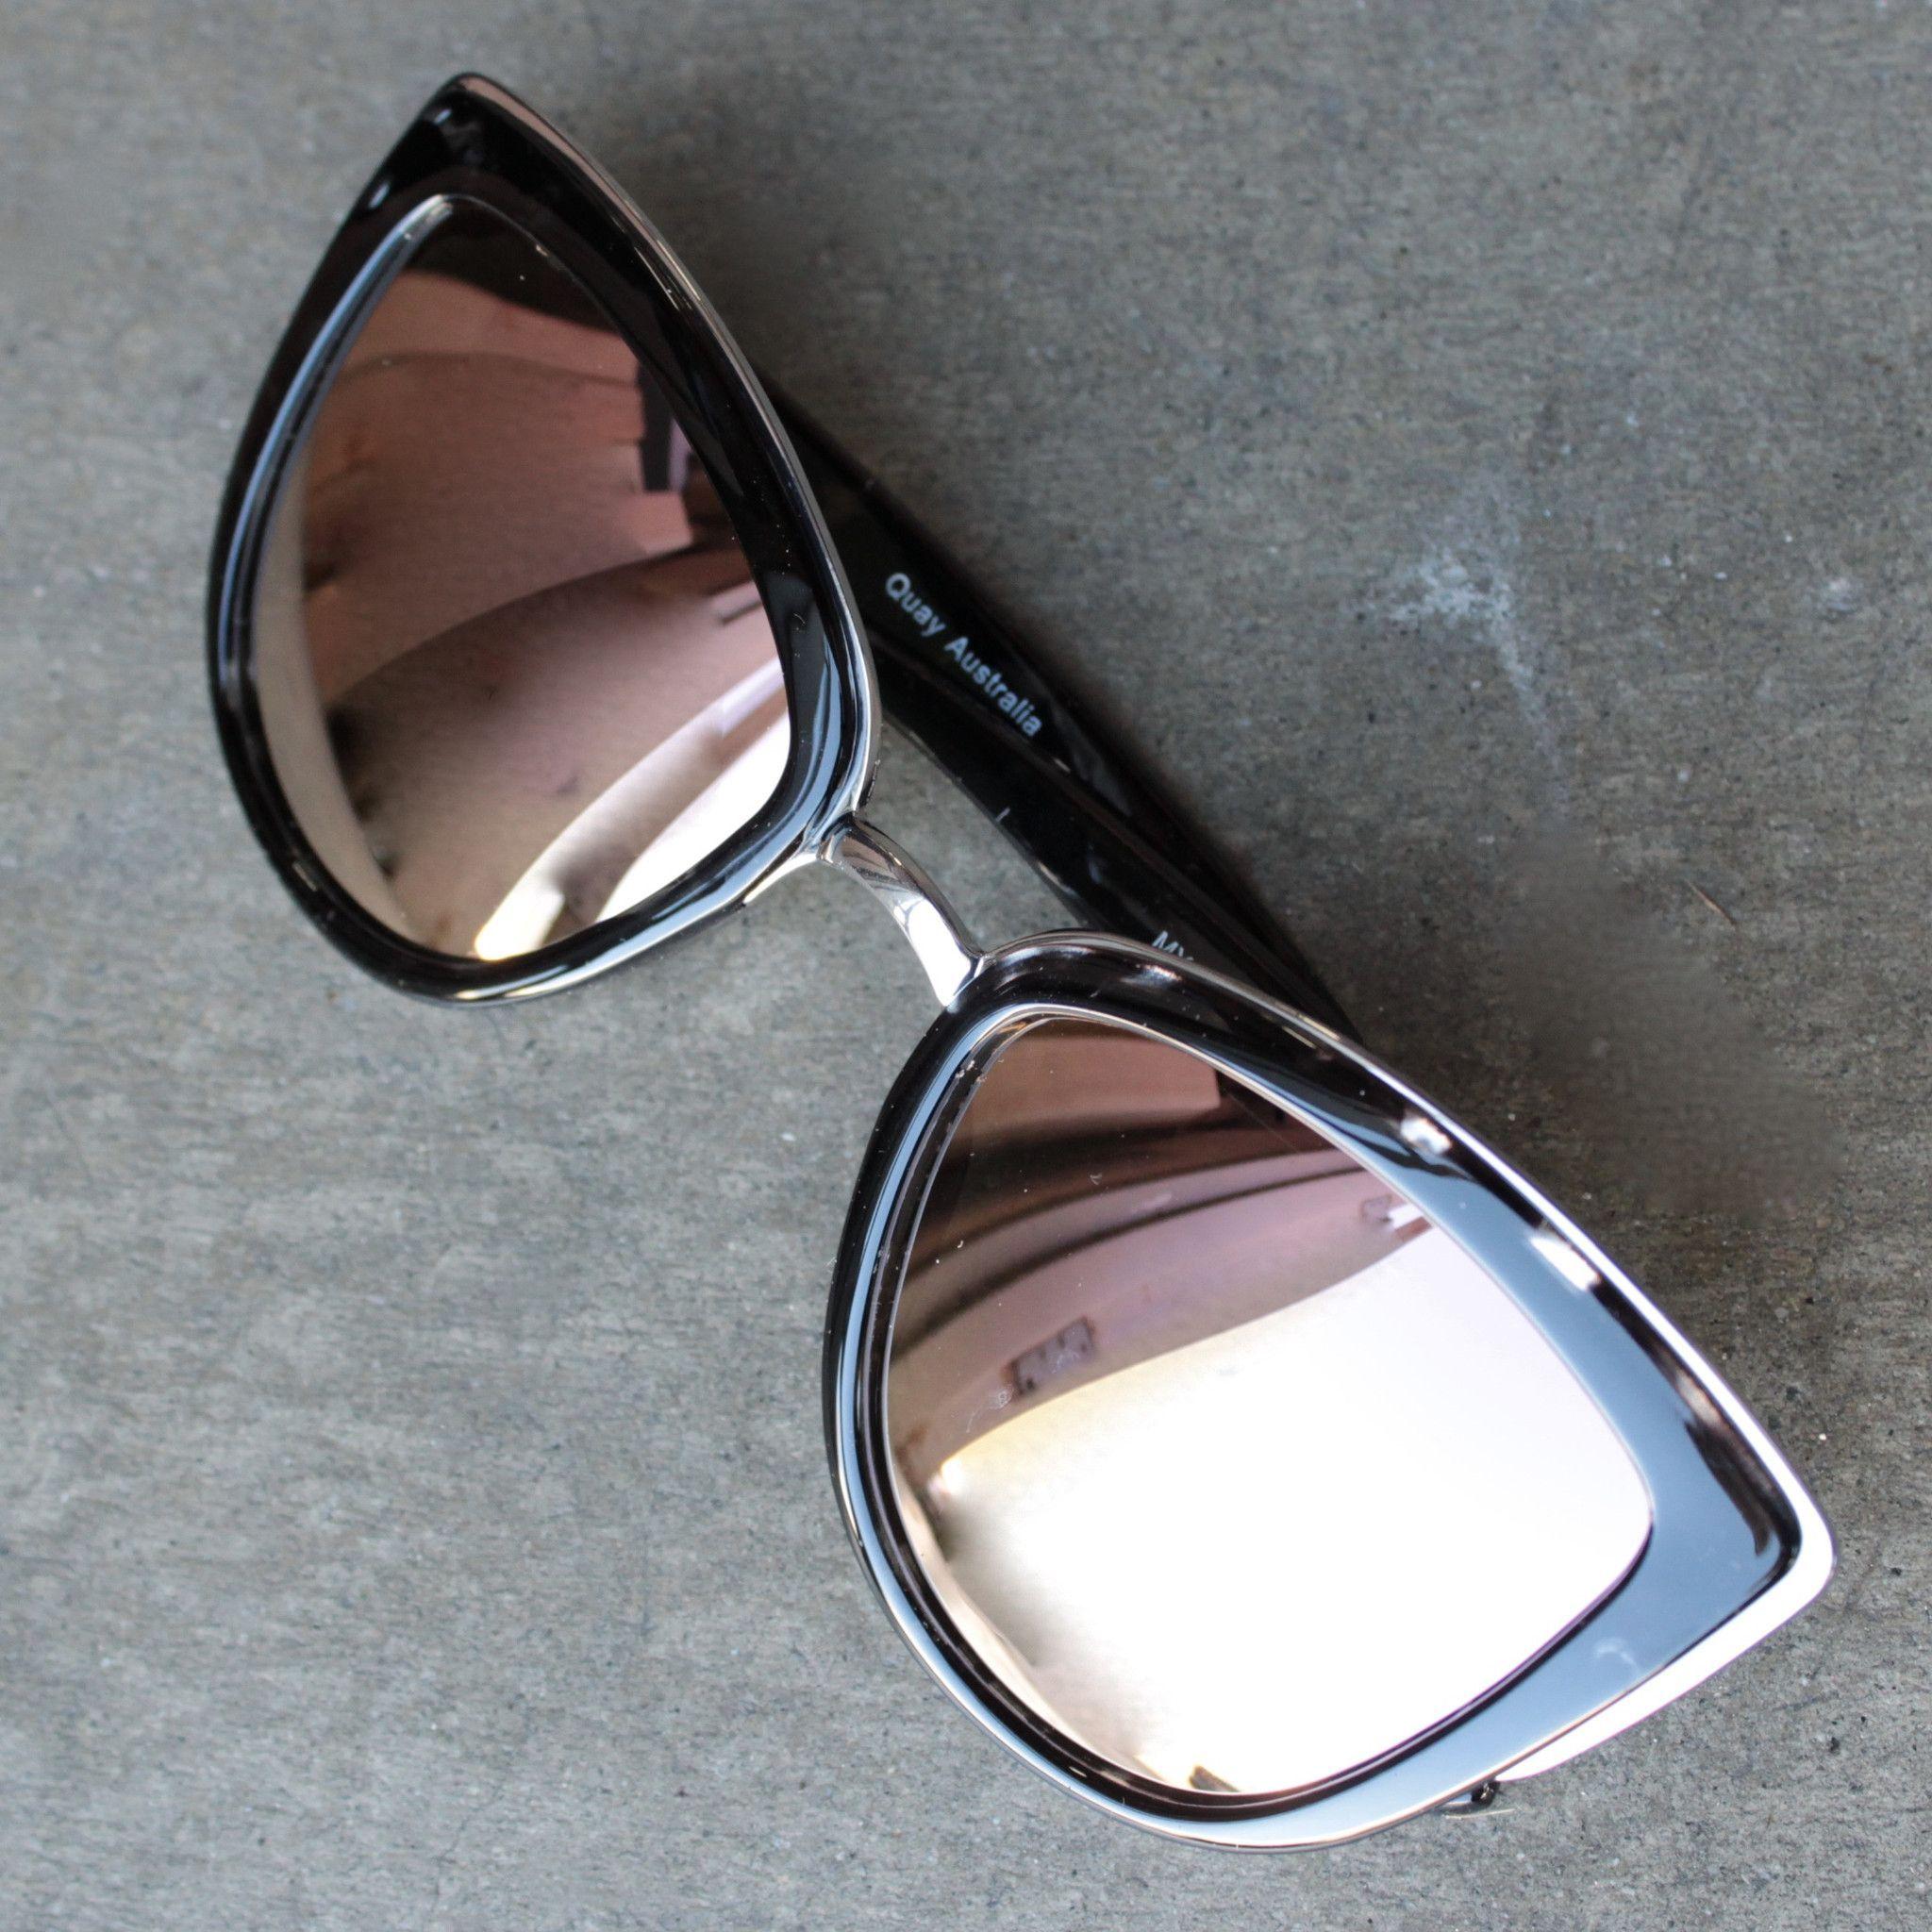 316f195c59a0a Quay My Girl Sunglasses (more colors) - blkt-pink